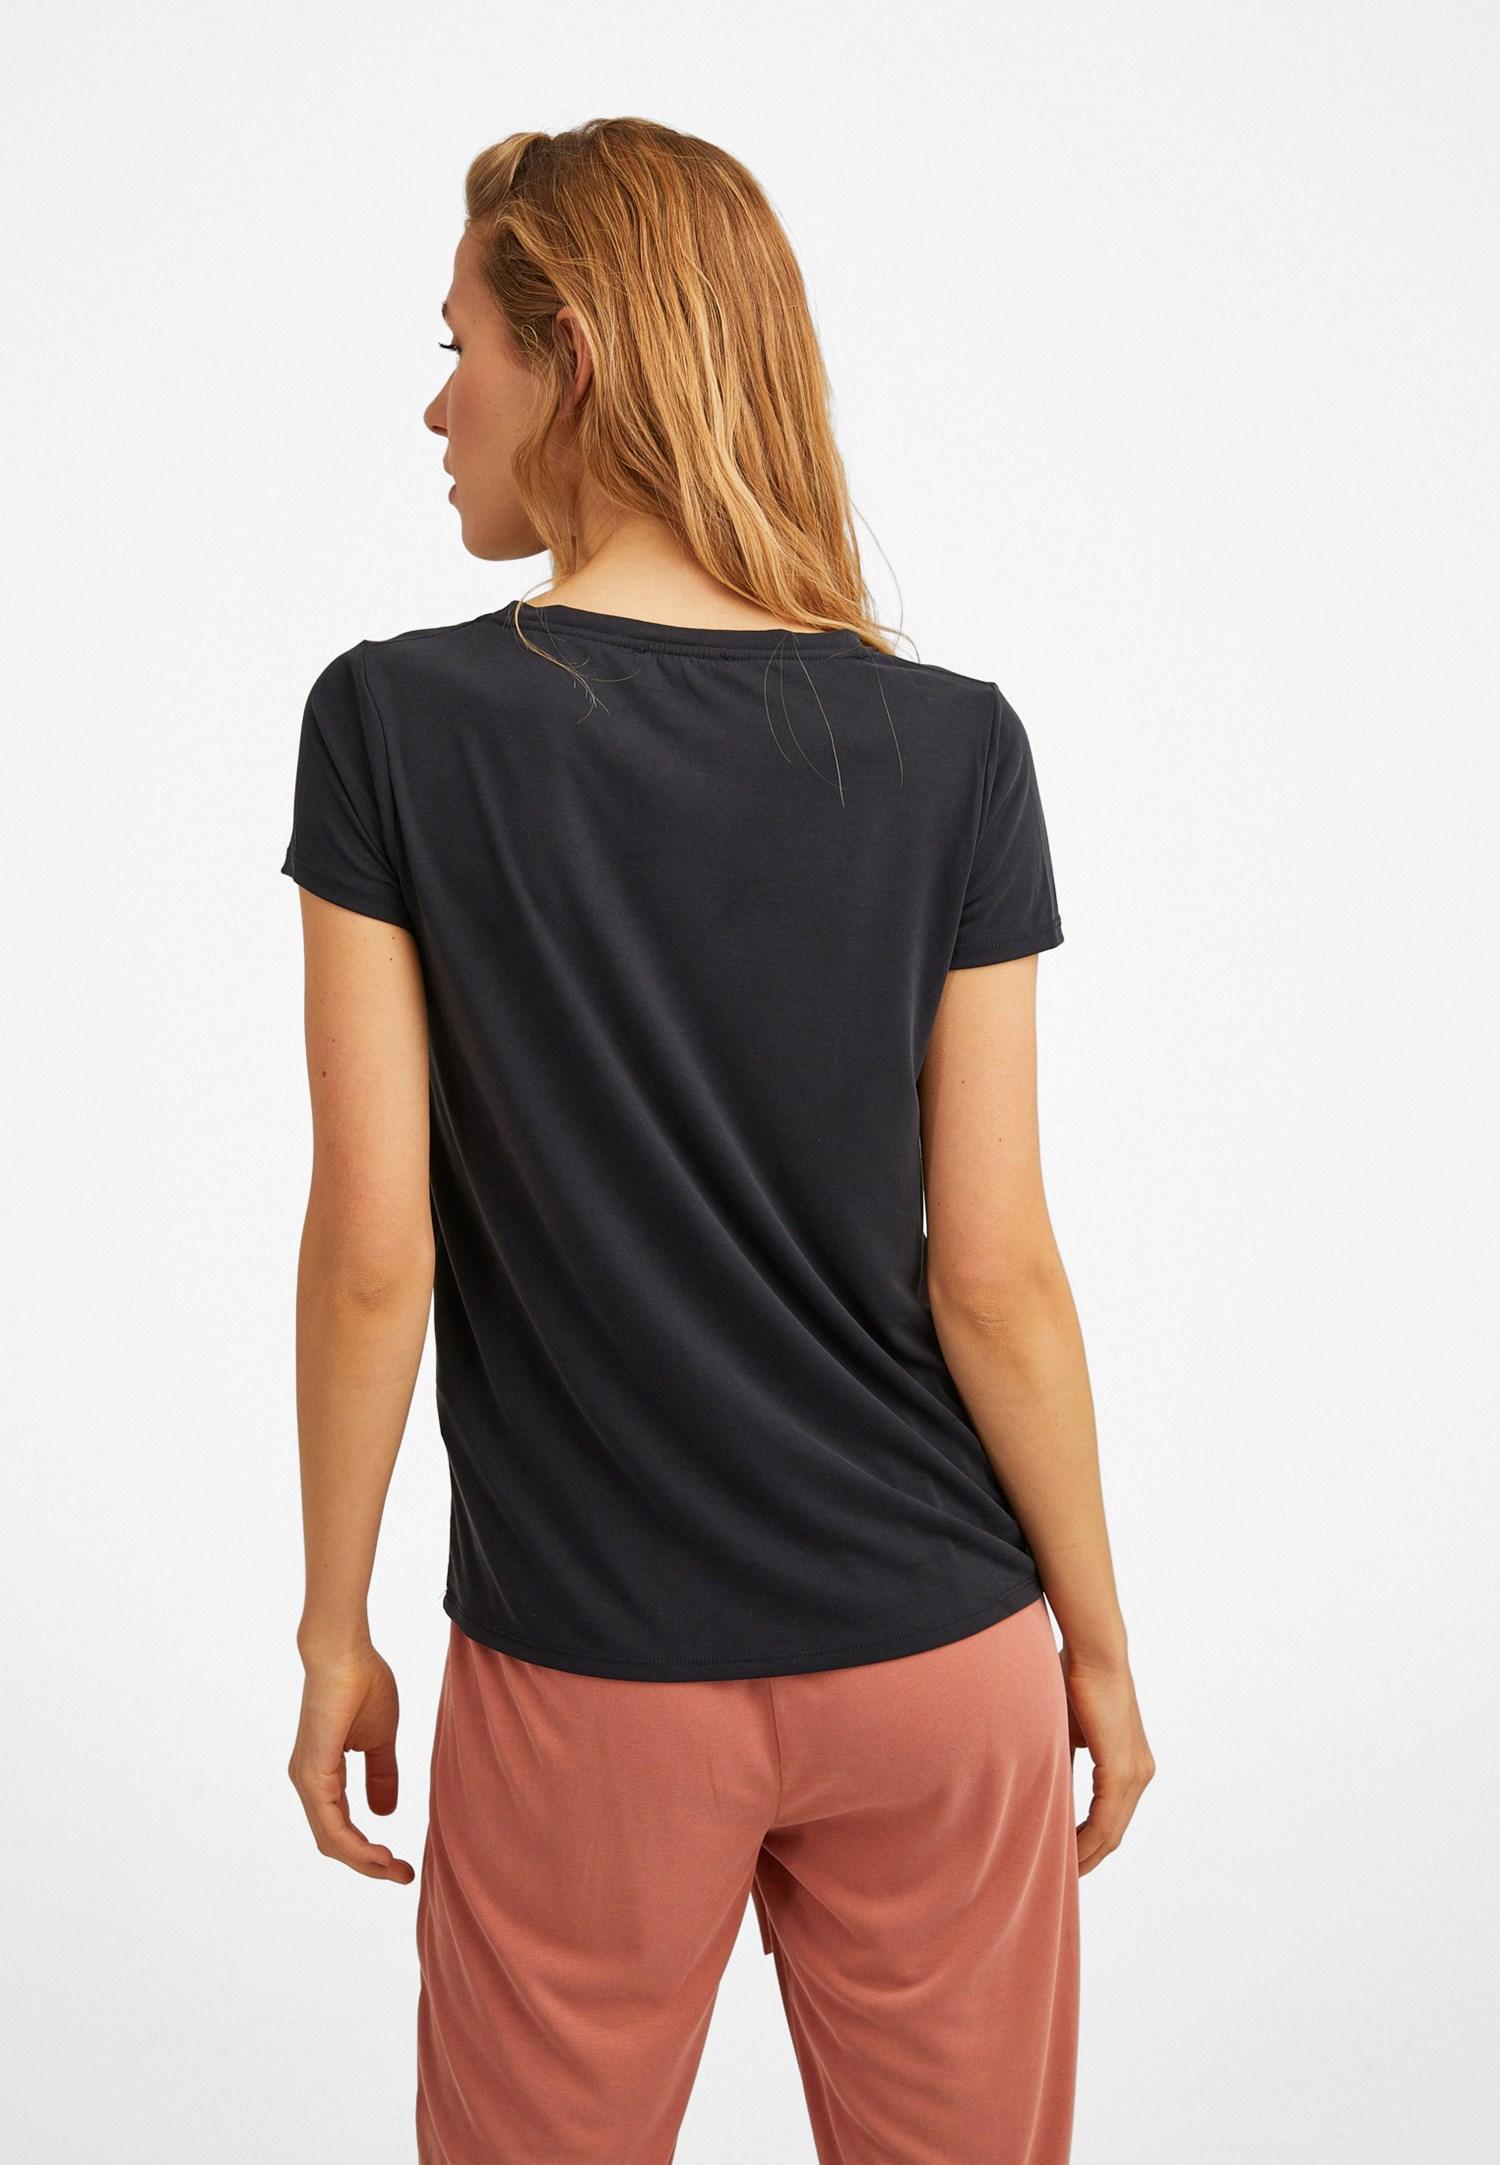 Bayan Siyah Yumuşak Tuşeli V Yaka Tişört